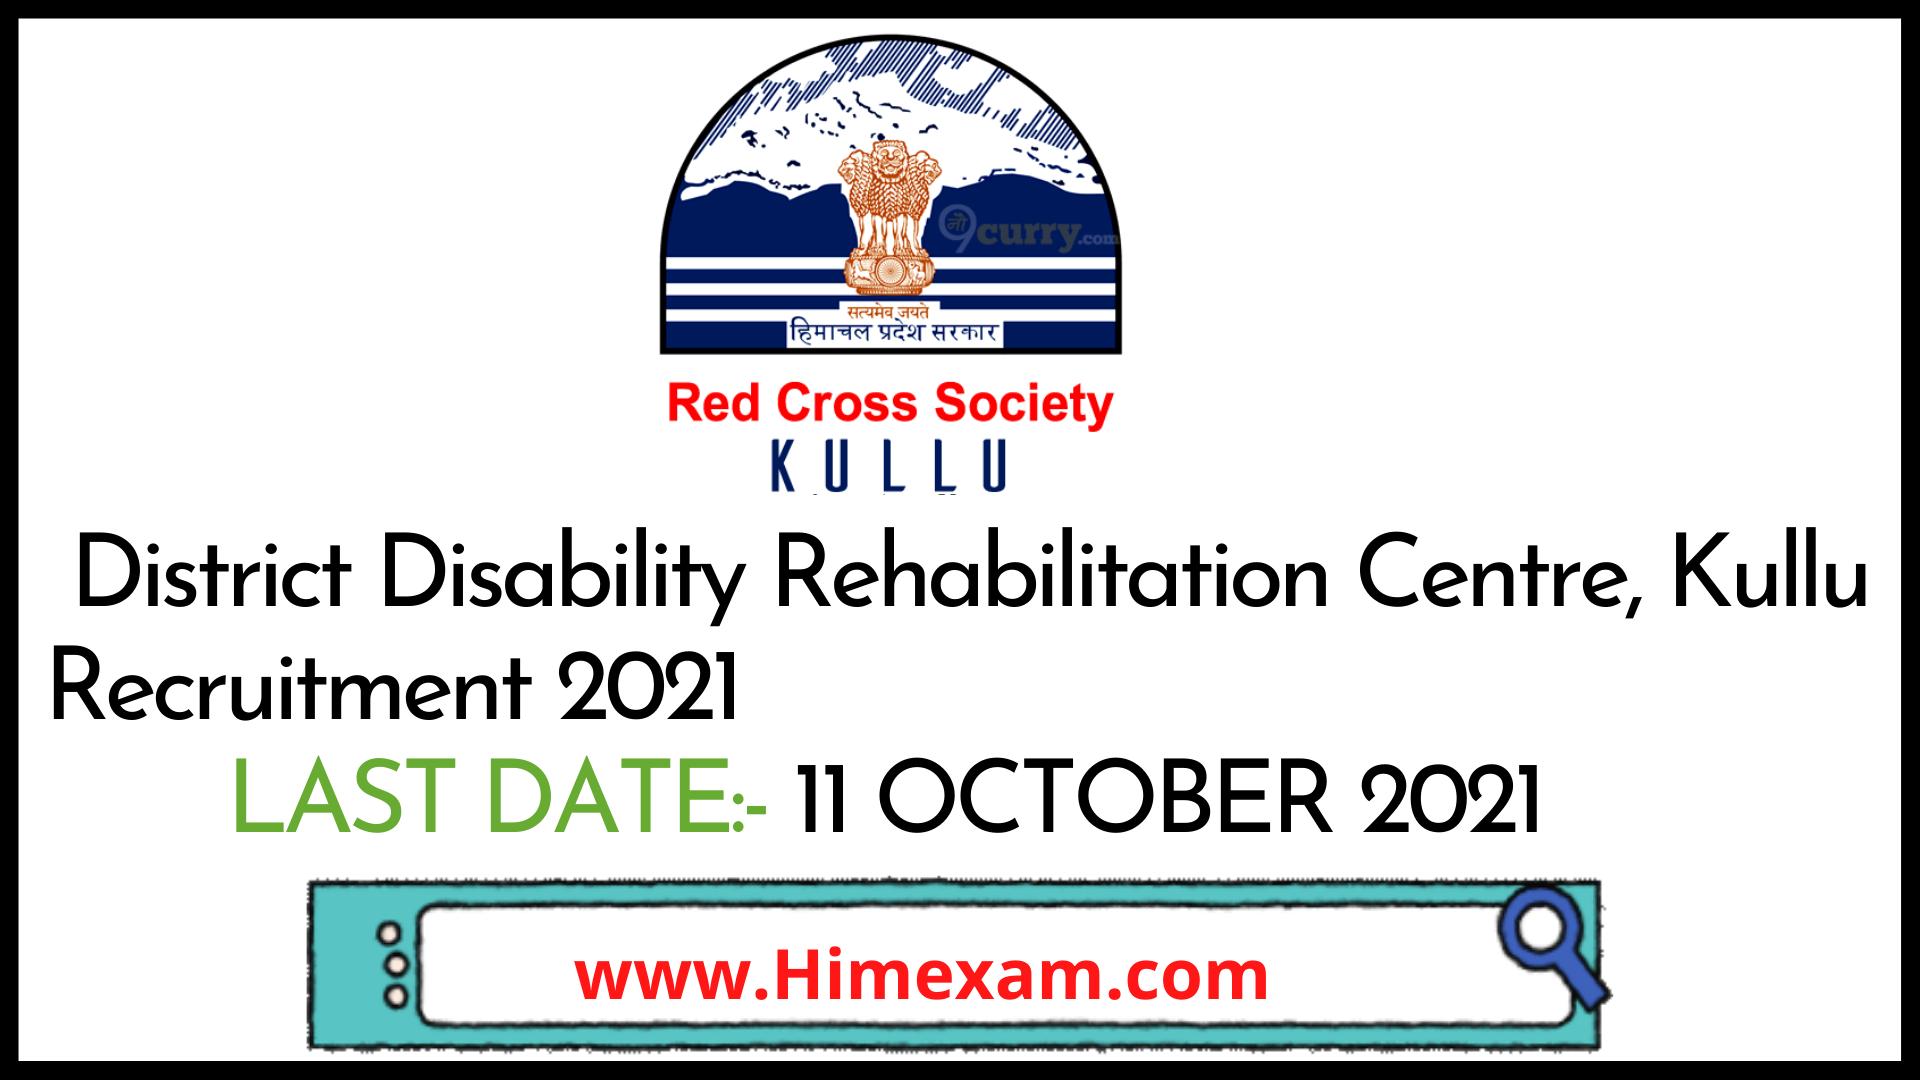 District Disability Rehabilitation Centre, Kullu Recruitment 2021